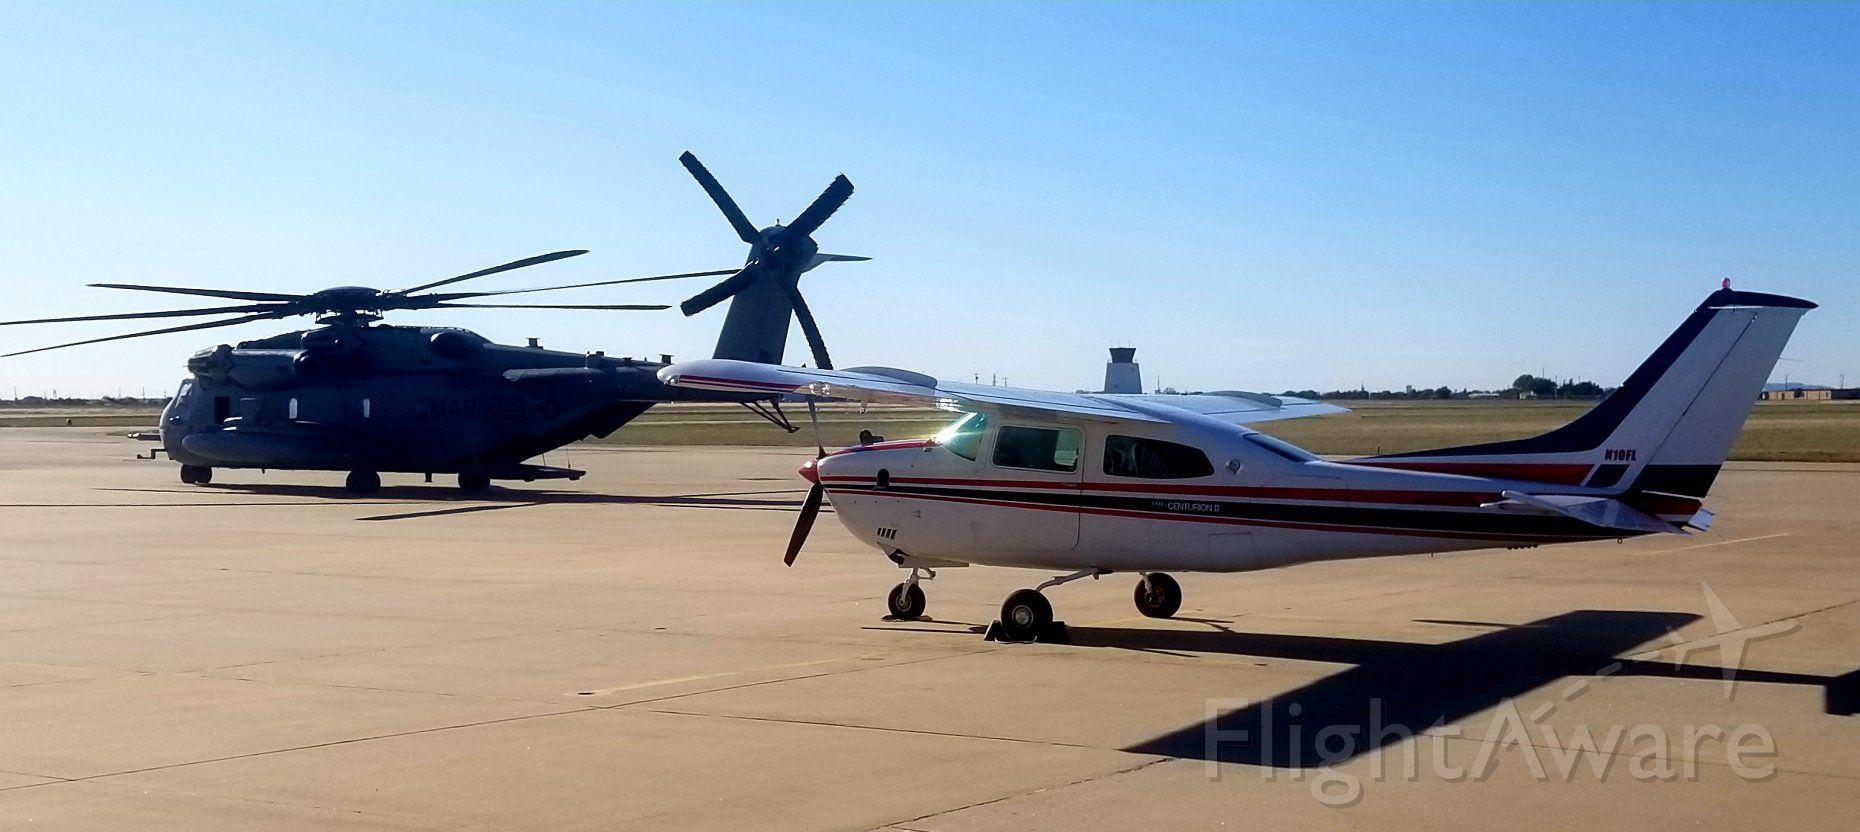 Cessna T210 Turbo Centurion (N10FL) - Chopper refueling and Cessna visiting